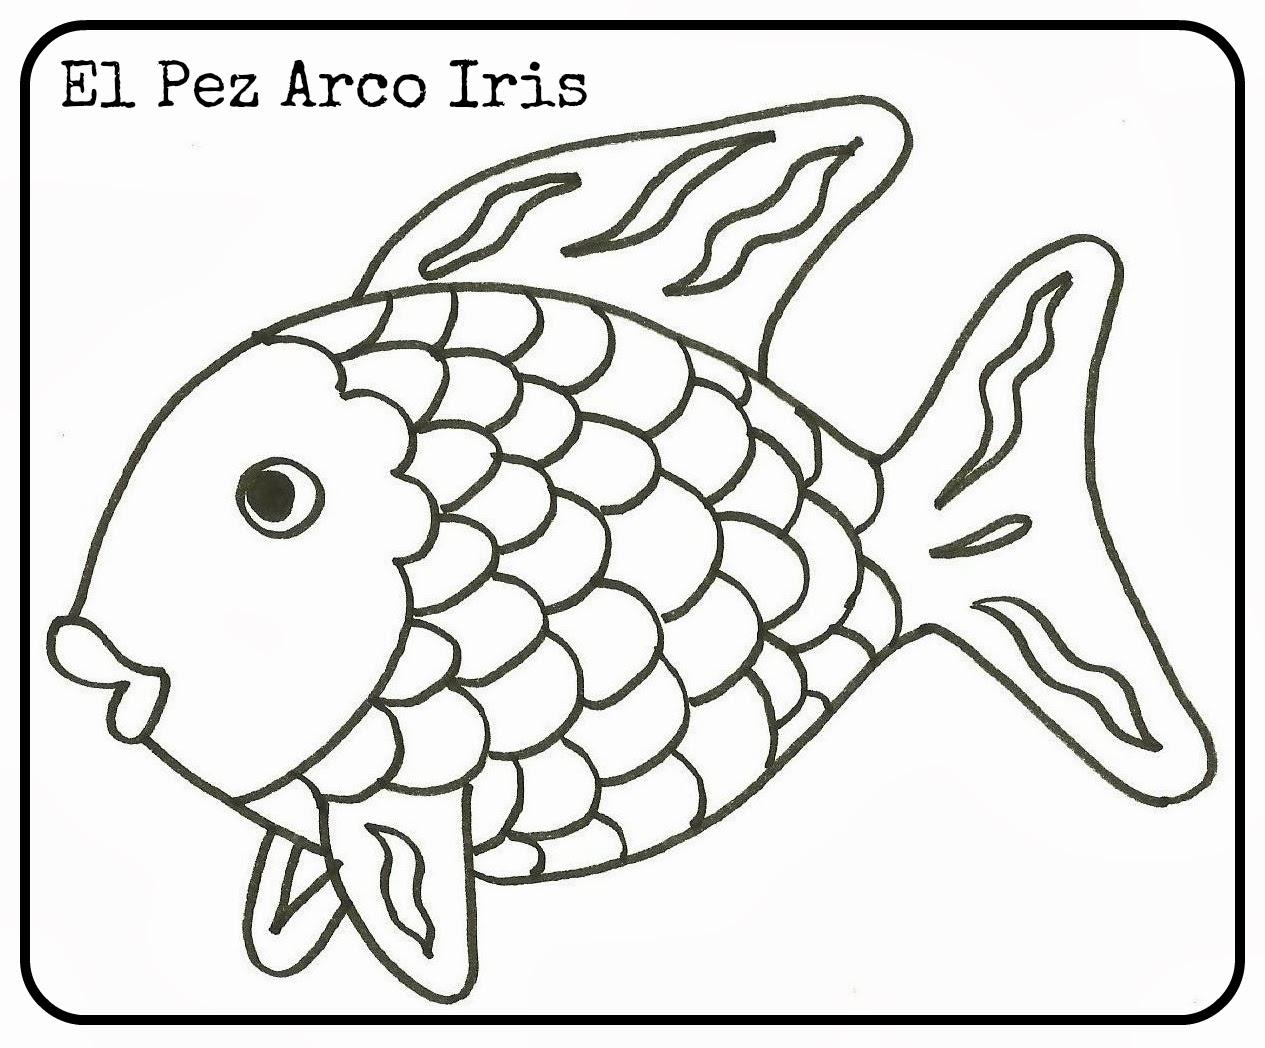 EN EL FONDO DEL MAR : El pez arco iris (Marcus Pfister) – La magia ...